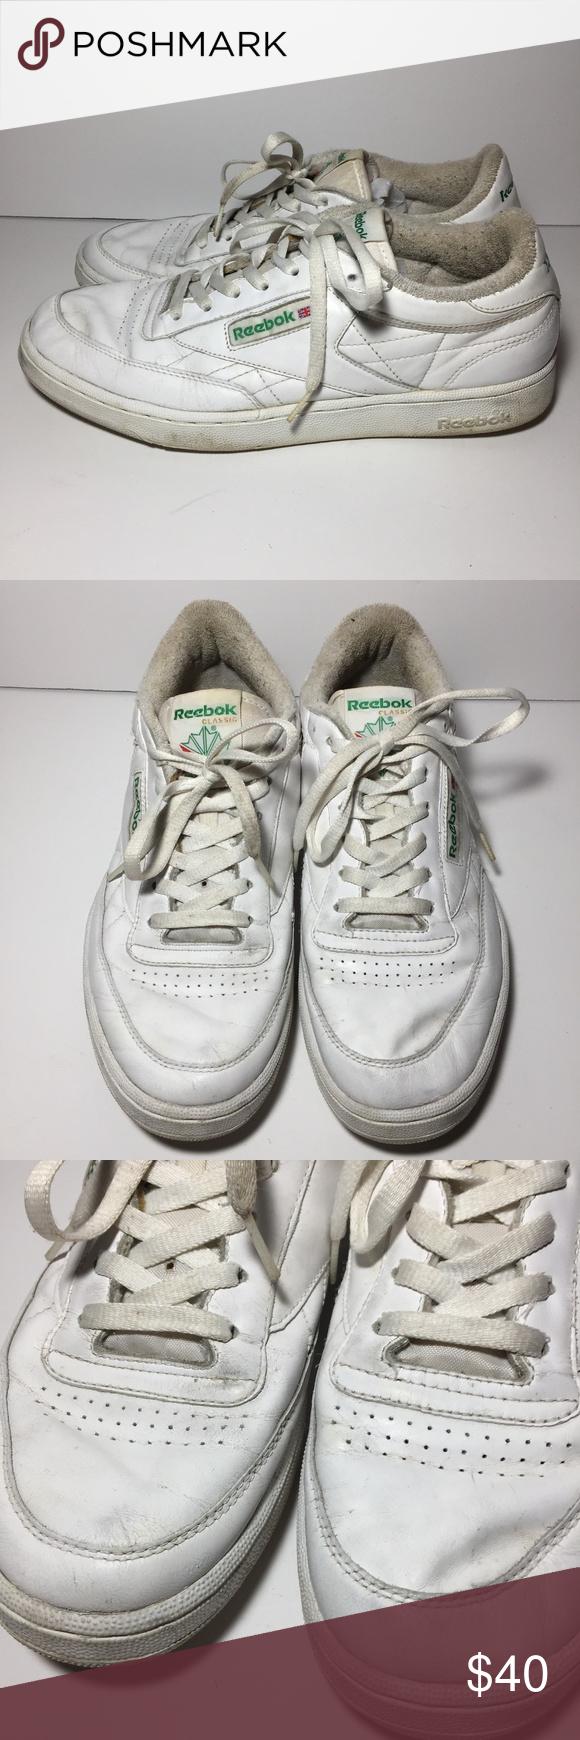 c9de3a0b39e753 Vintage Reebok Classic Club C 85 Shoes White 10.5 Preowned vintage Reebok  Classic Club C 85 solid white with green logo shoes men s size 10.5 Wide 2E  ...